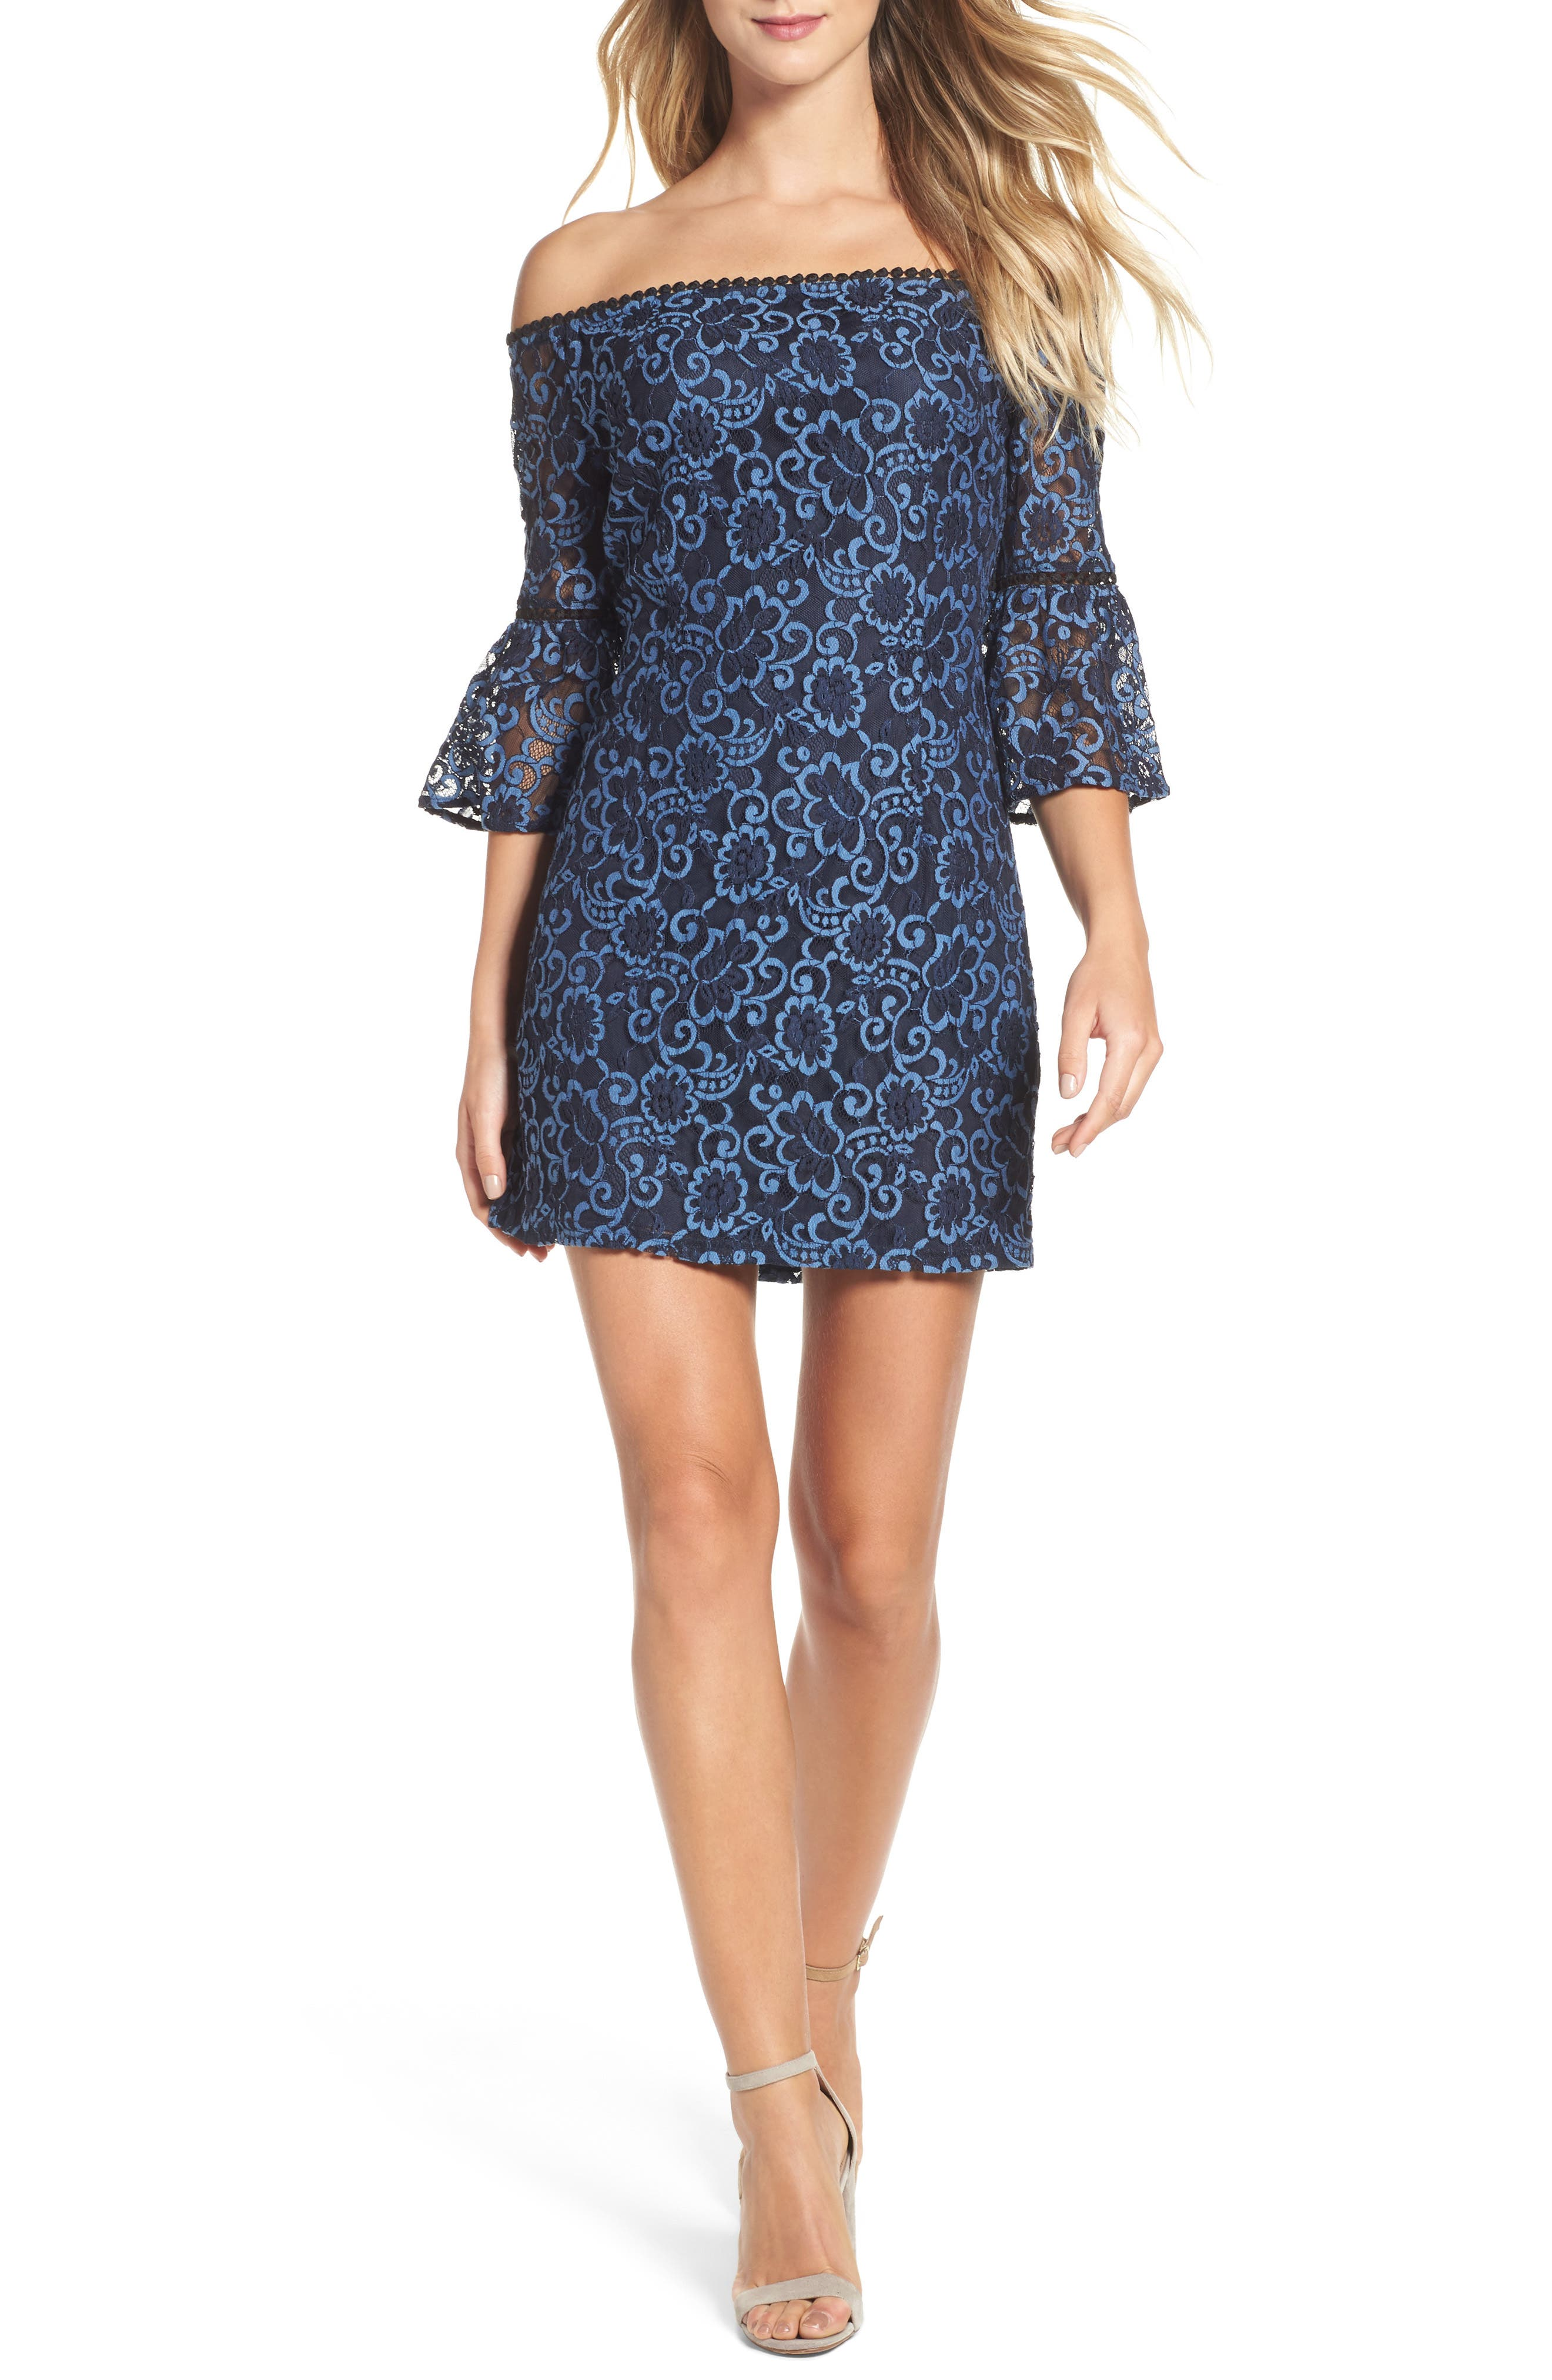 Danlyn Off the Shoulder Lace Minidress,                             Main thumbnail 1, color,                             Blue